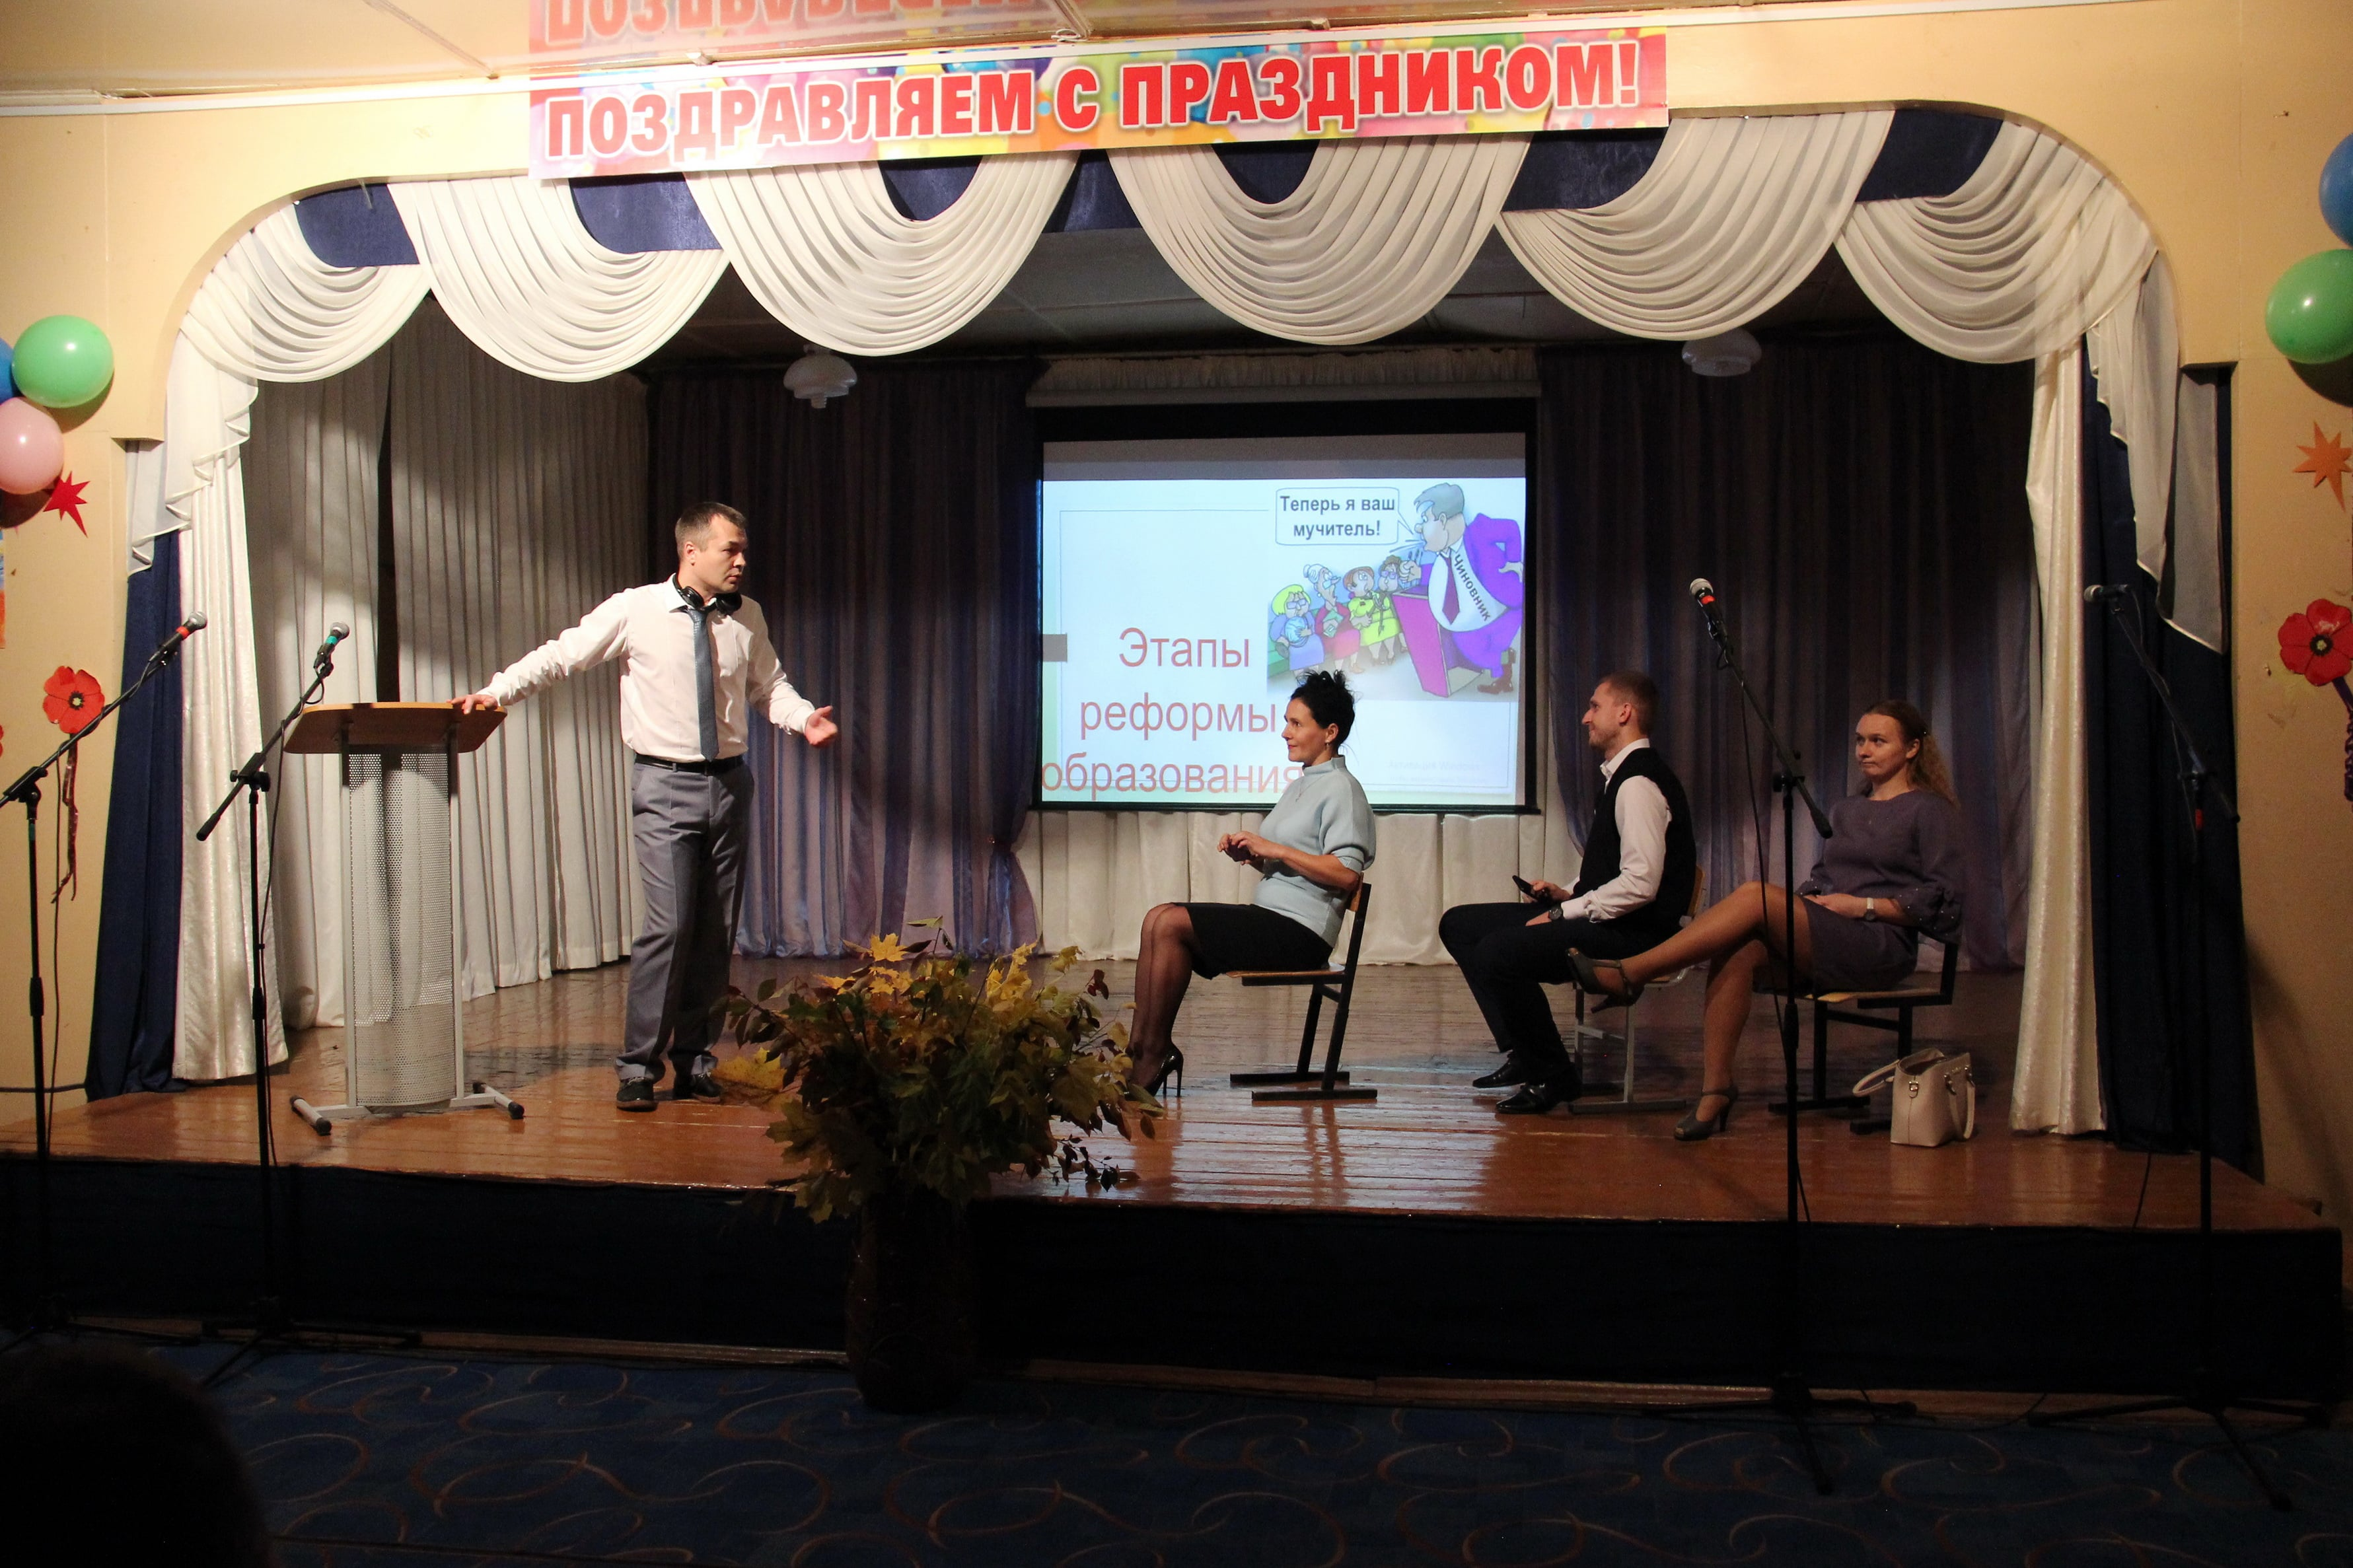 http://monuspen.ru/photoreports/f99f36fb8c0615660f656fe4f1b72c7v.JPG